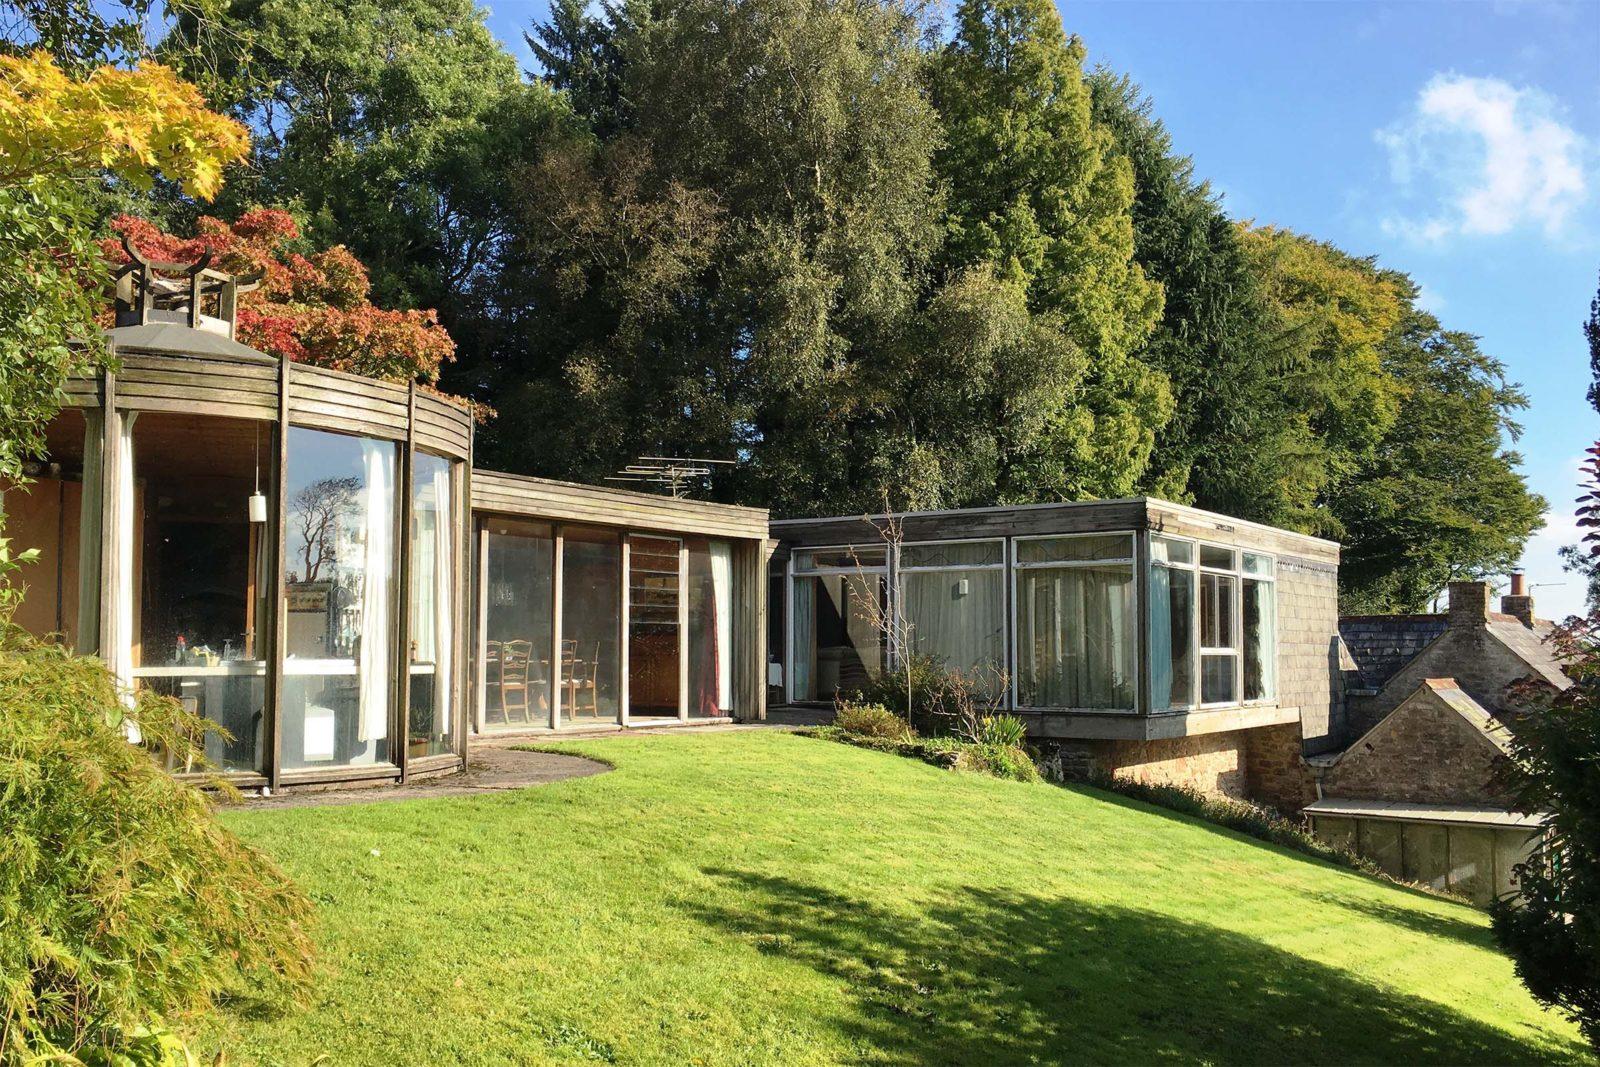 Chewton Mendip, Prestons, The Modern House